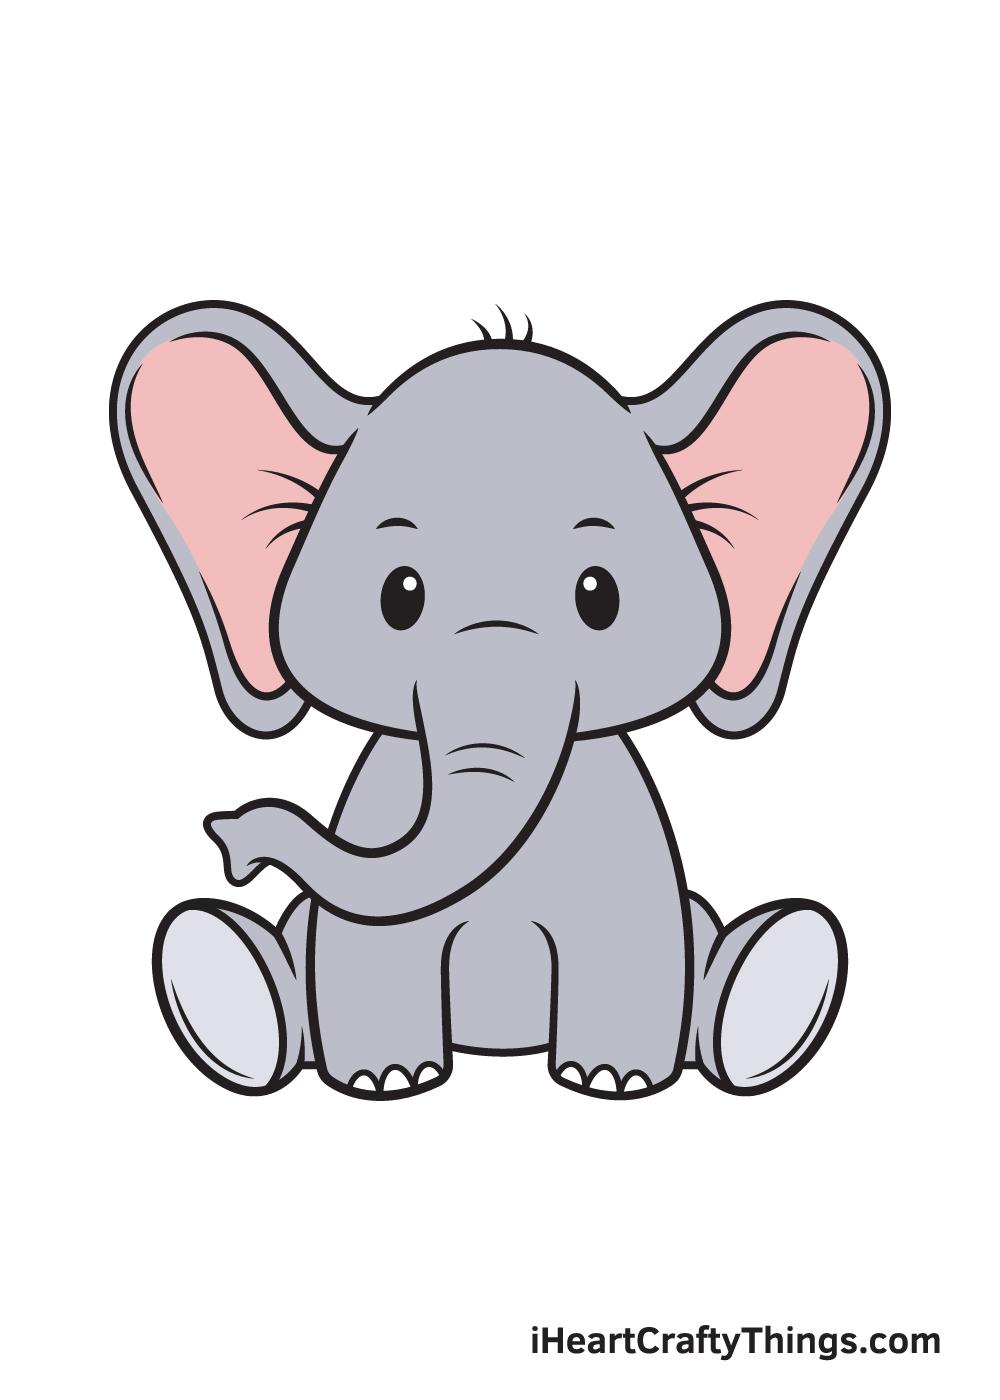 Elephant Drawing – 9 Steps